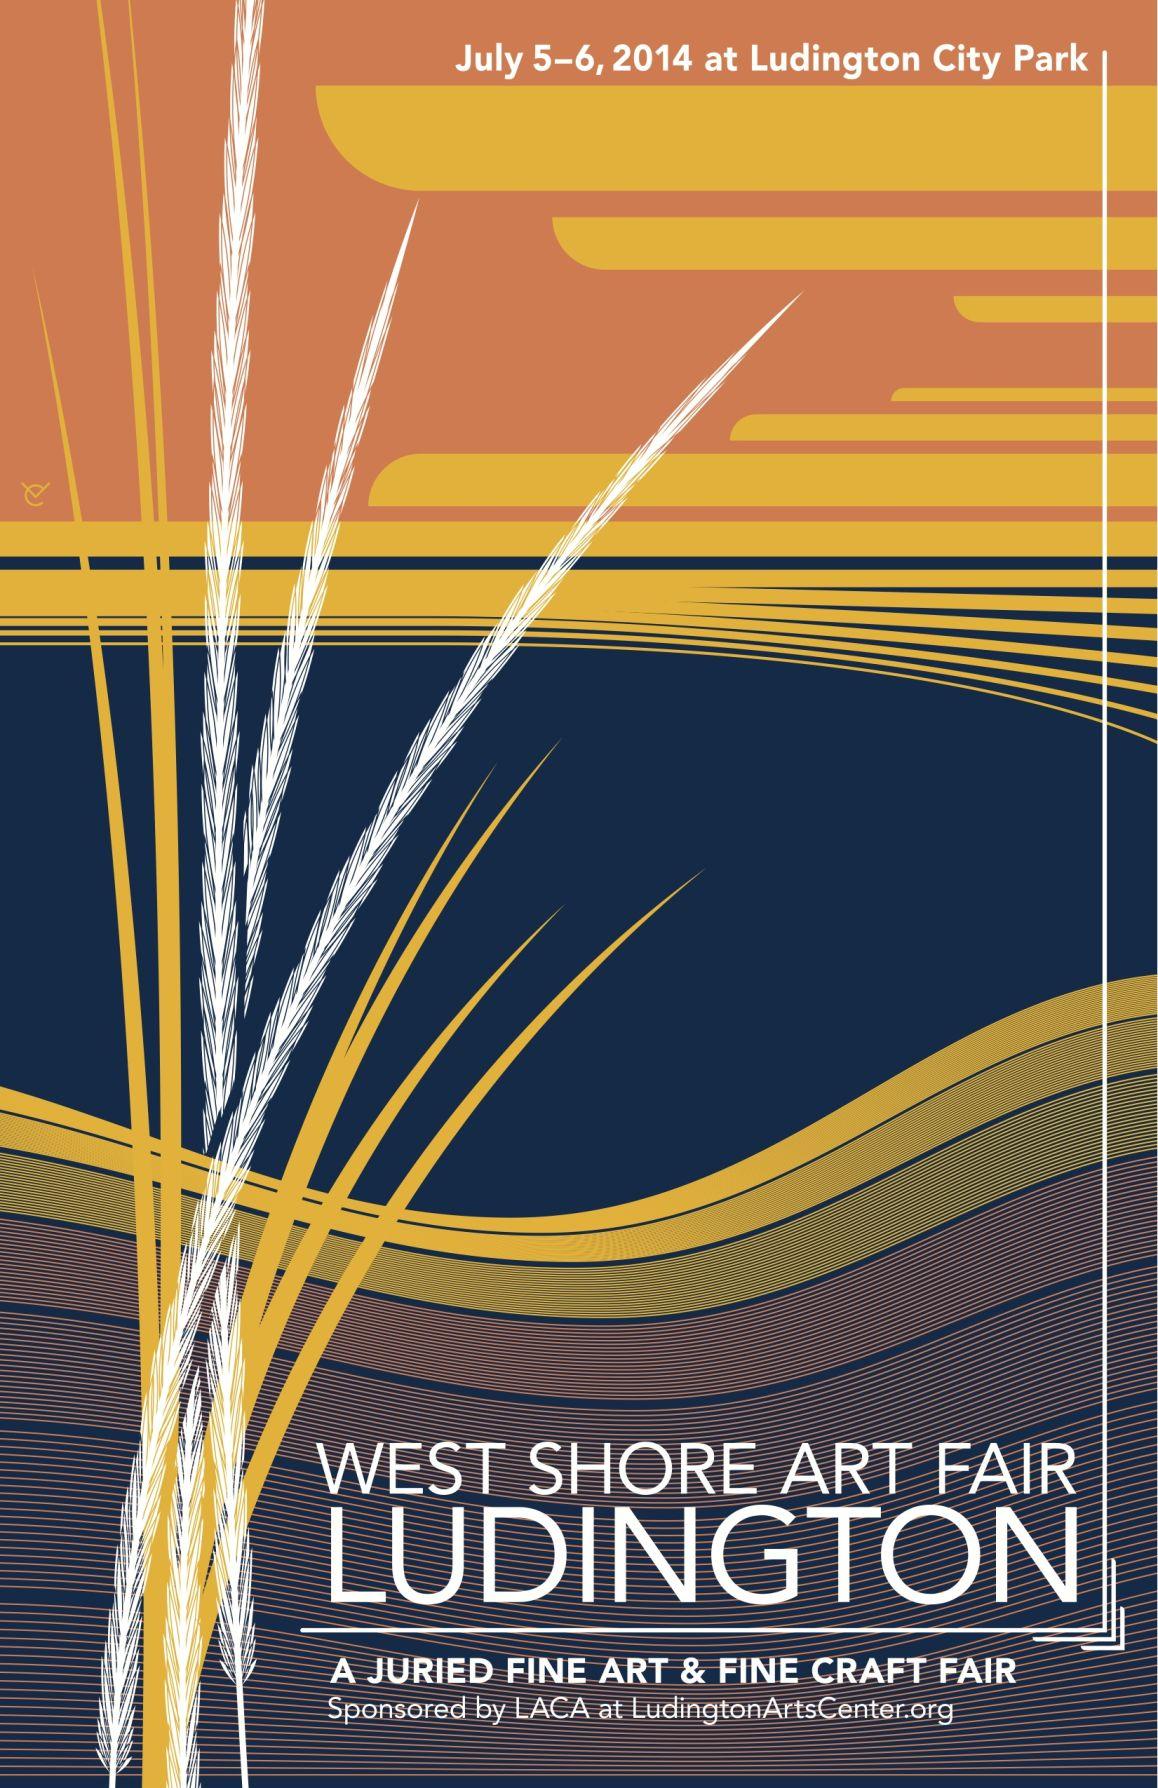 Best poster design 2014 - 2014 West Shore Art Fair Poster Design